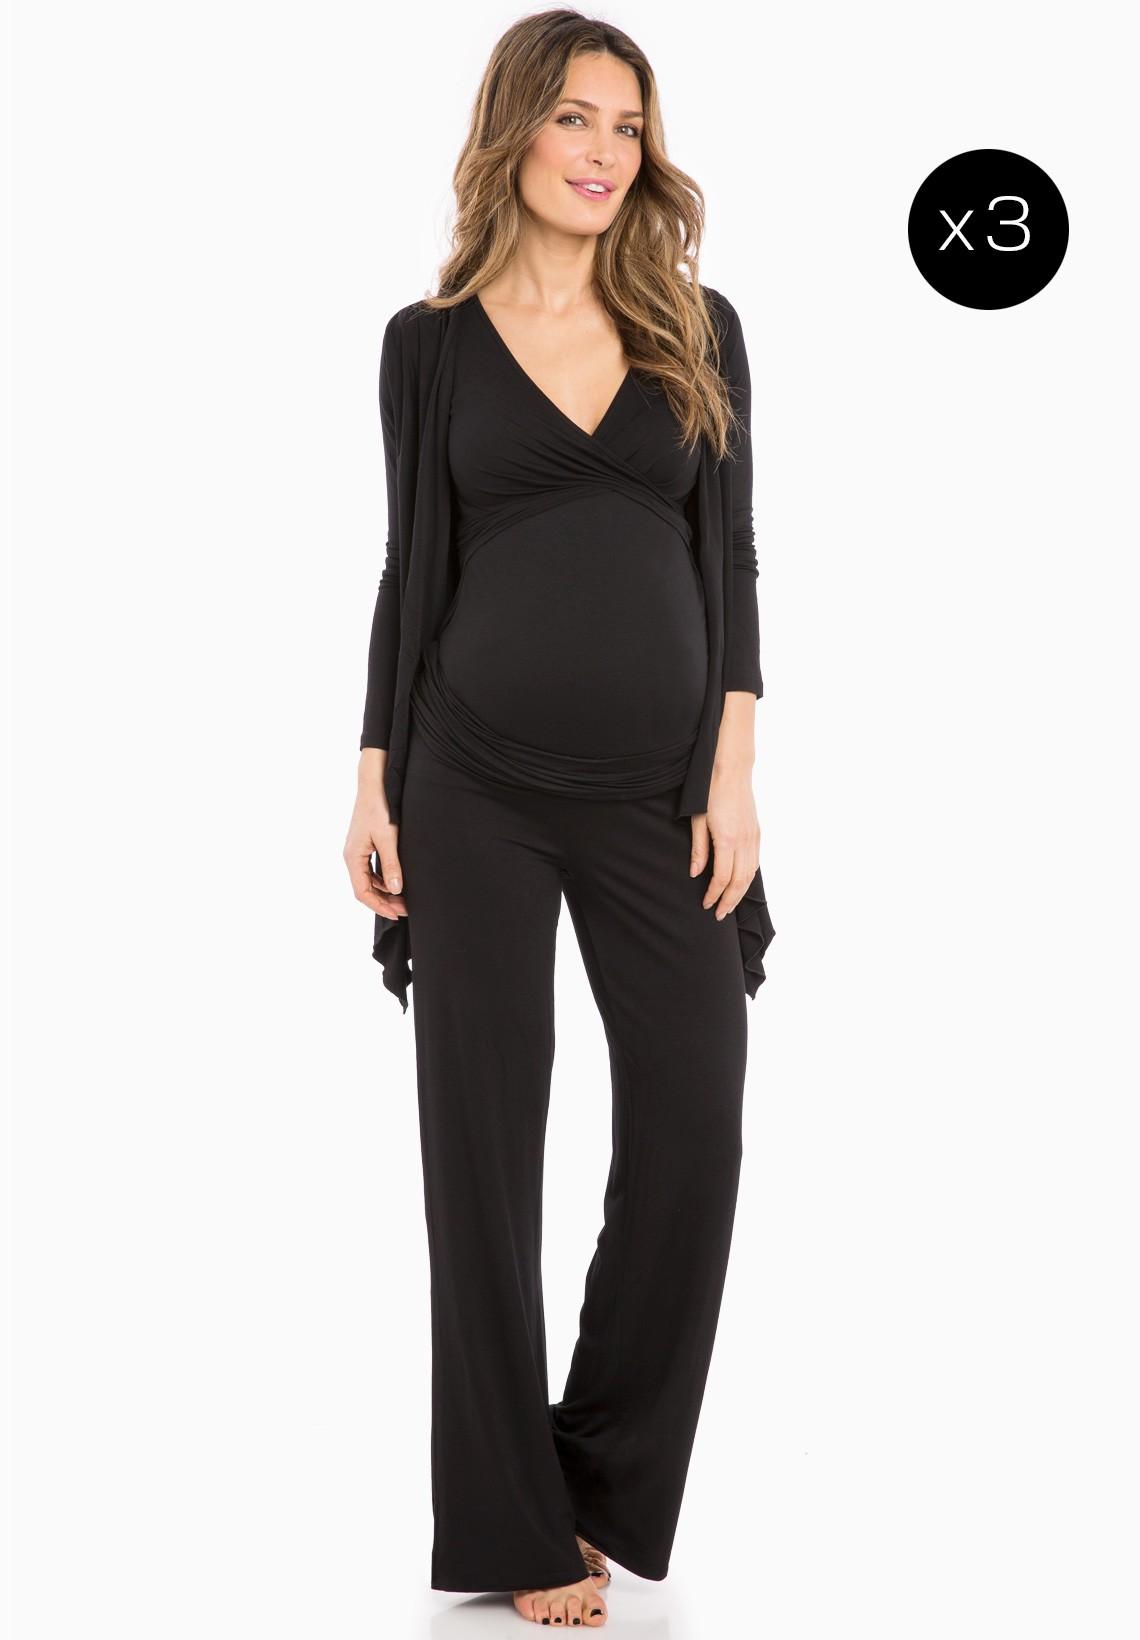 vetement femme enceinte